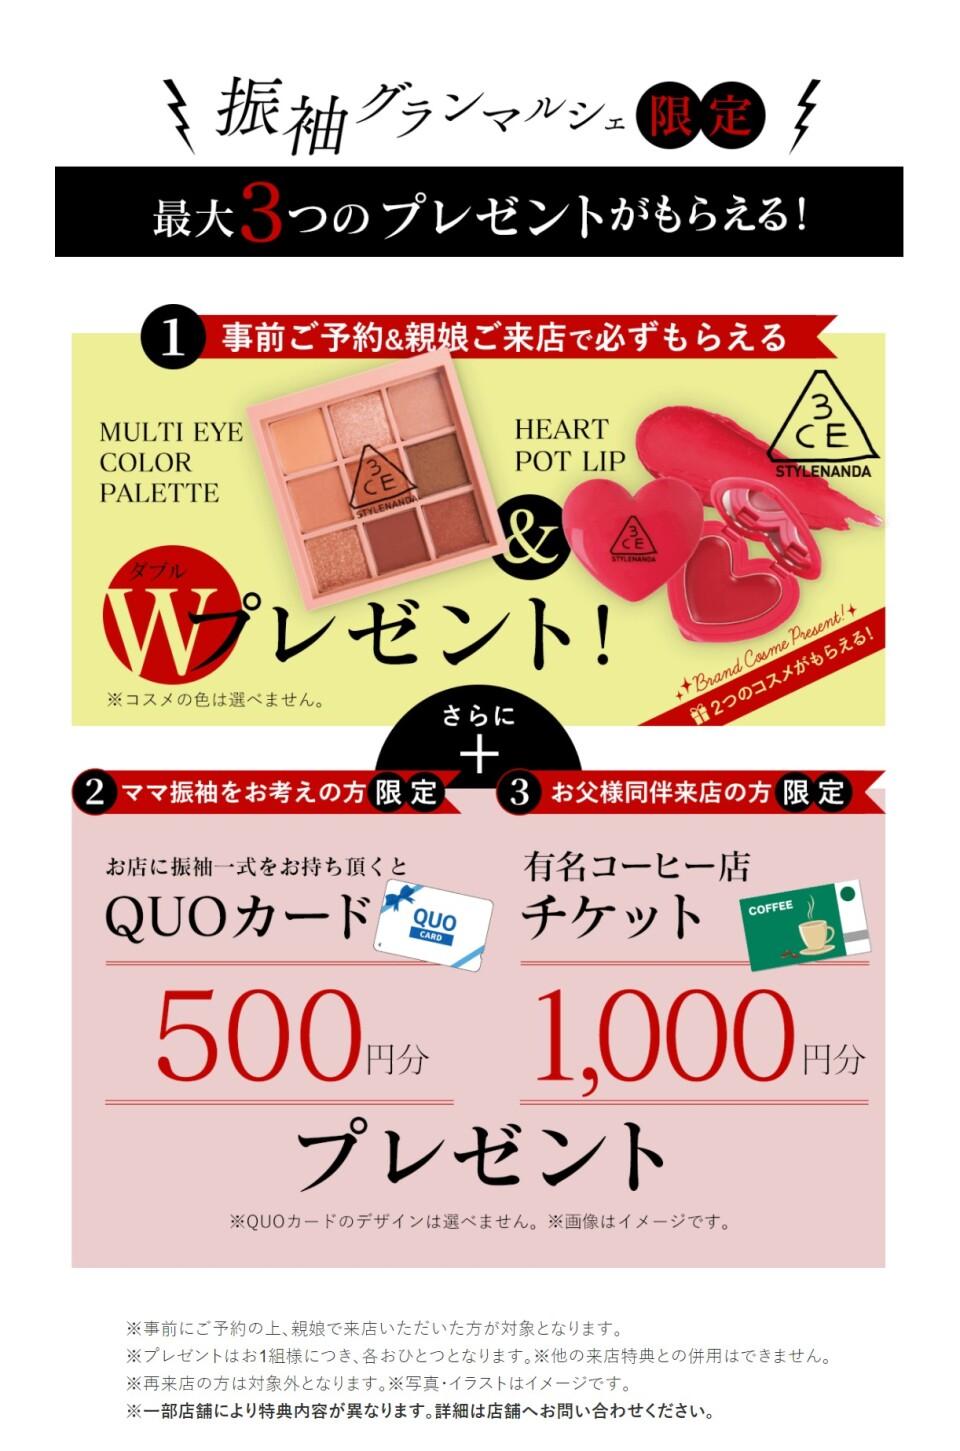 FireShot Capture 6403 - 振袖グランマルシェ|成人式の振袖レンタル・販売オンディーヌ - www.ondine.jp